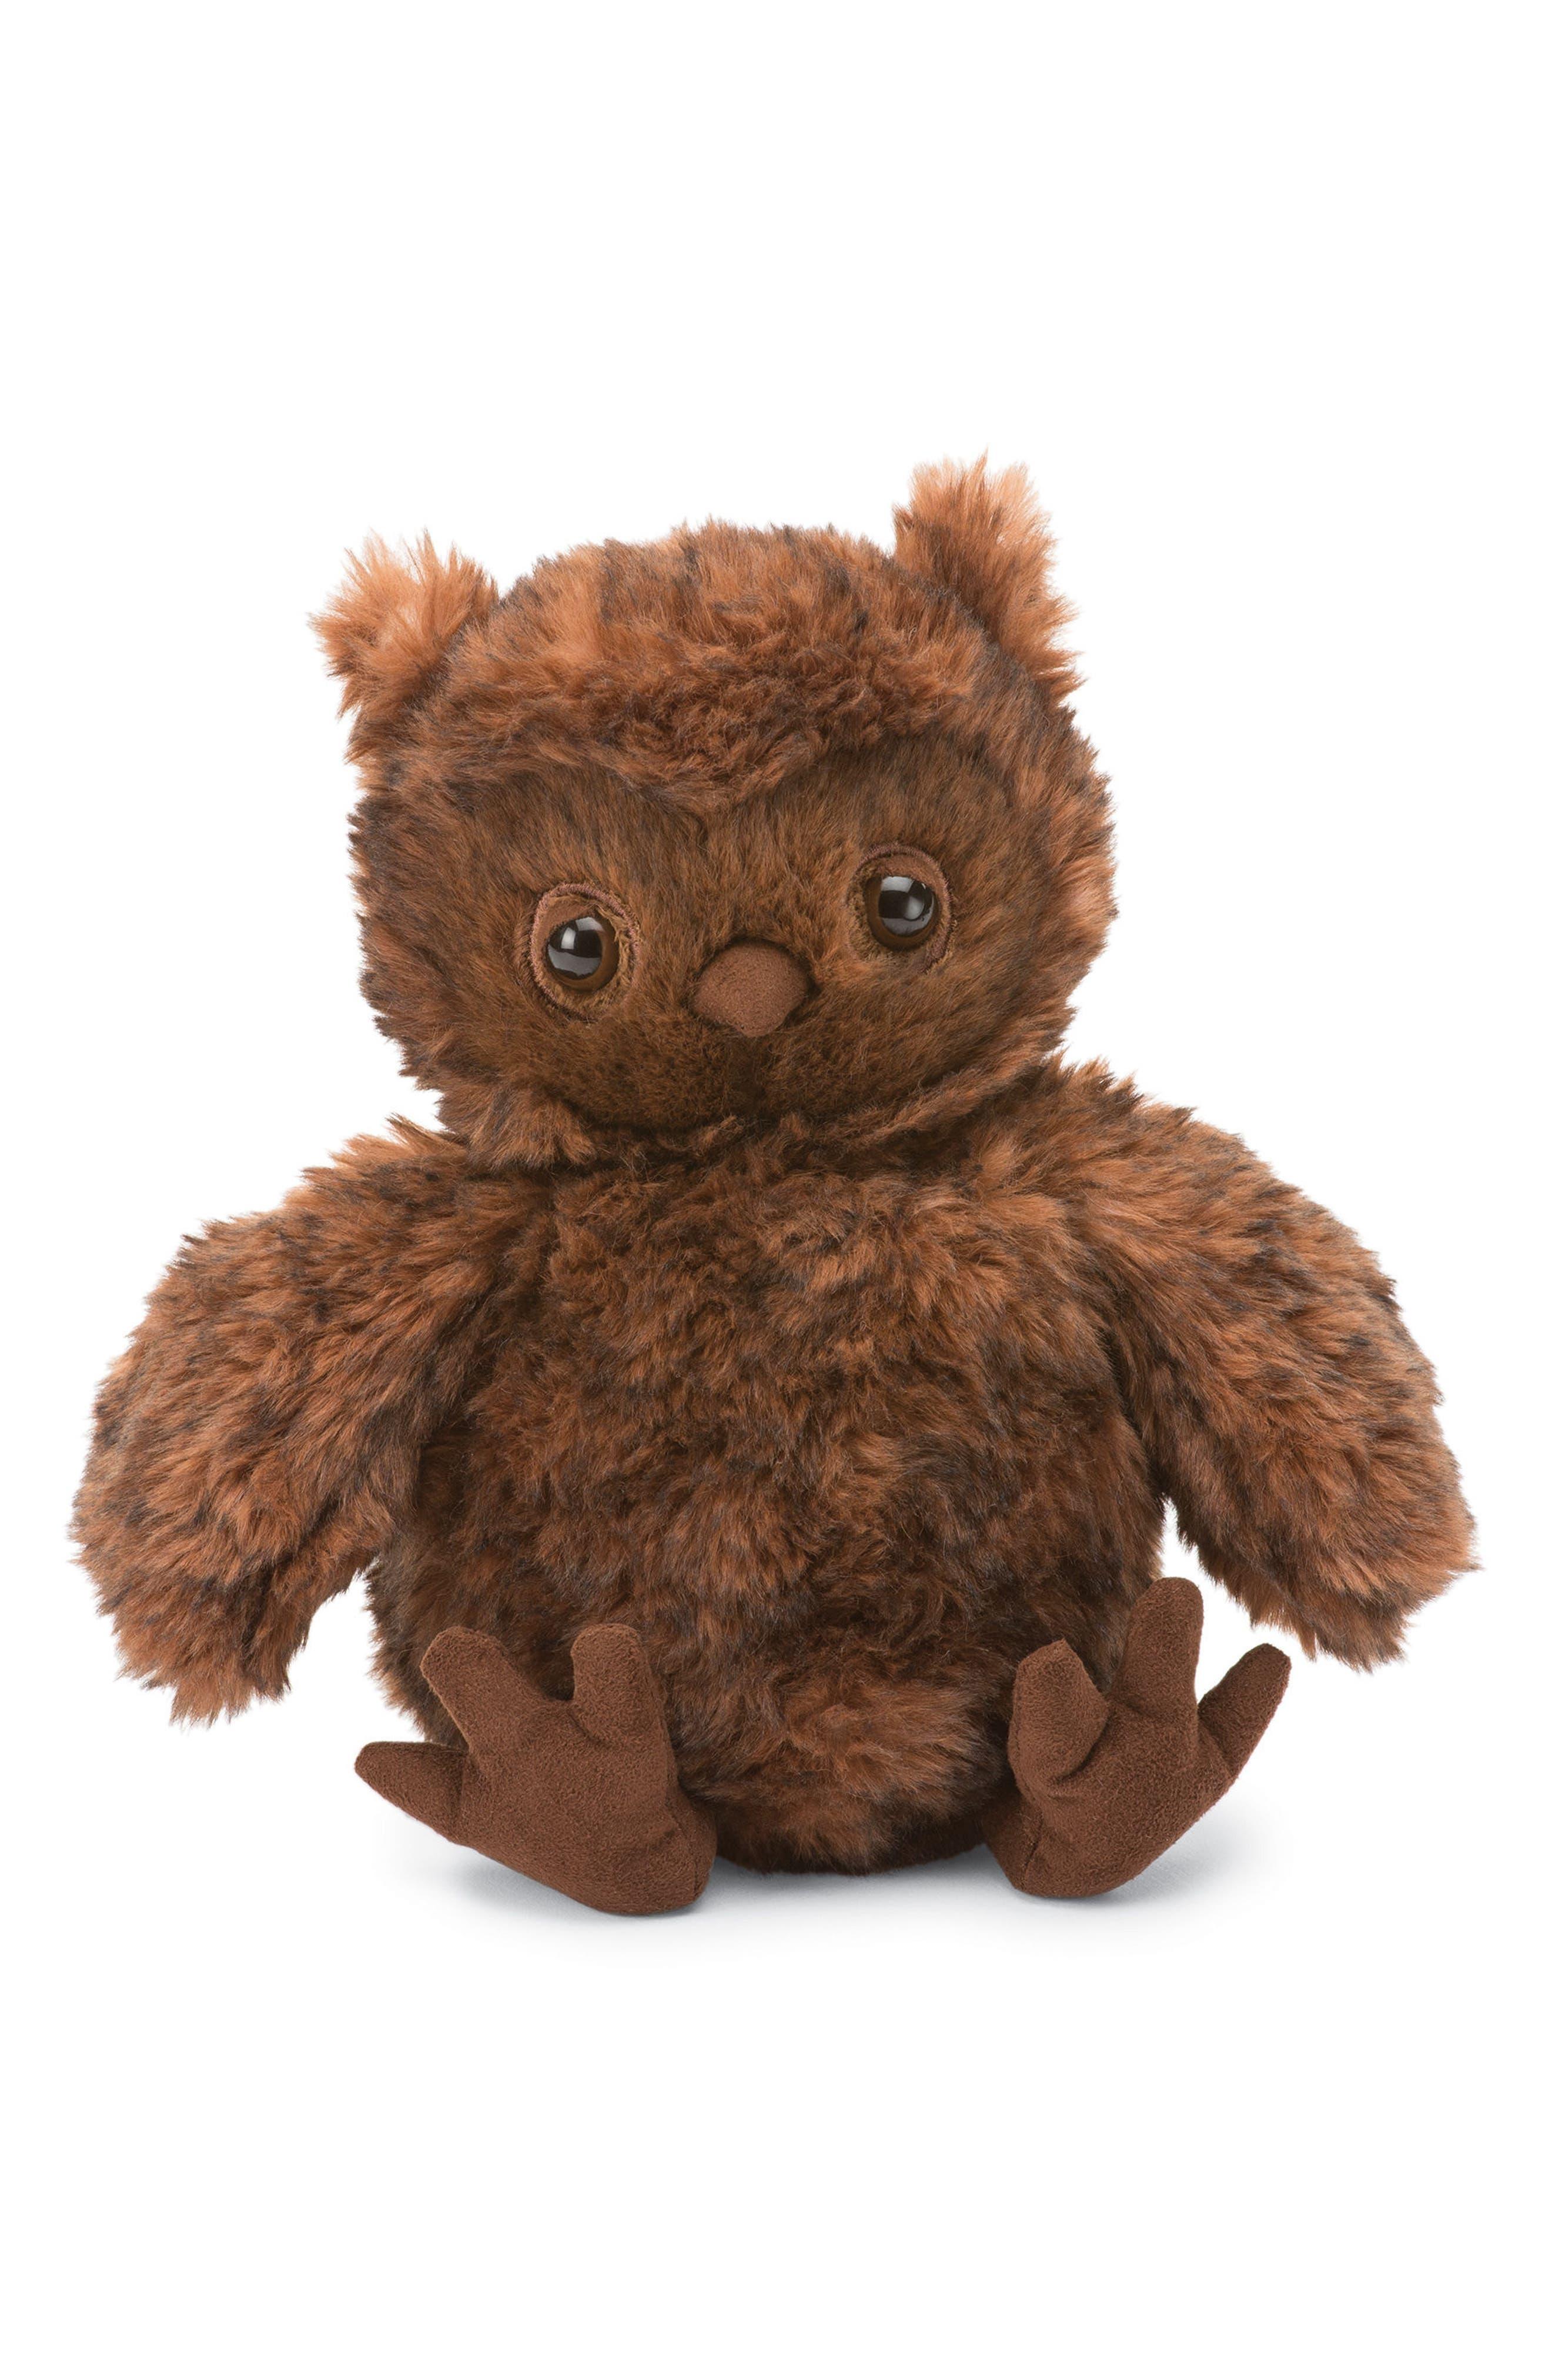 Cornelius the Owl Stuffed Animal,                         Main,                         color, Brown